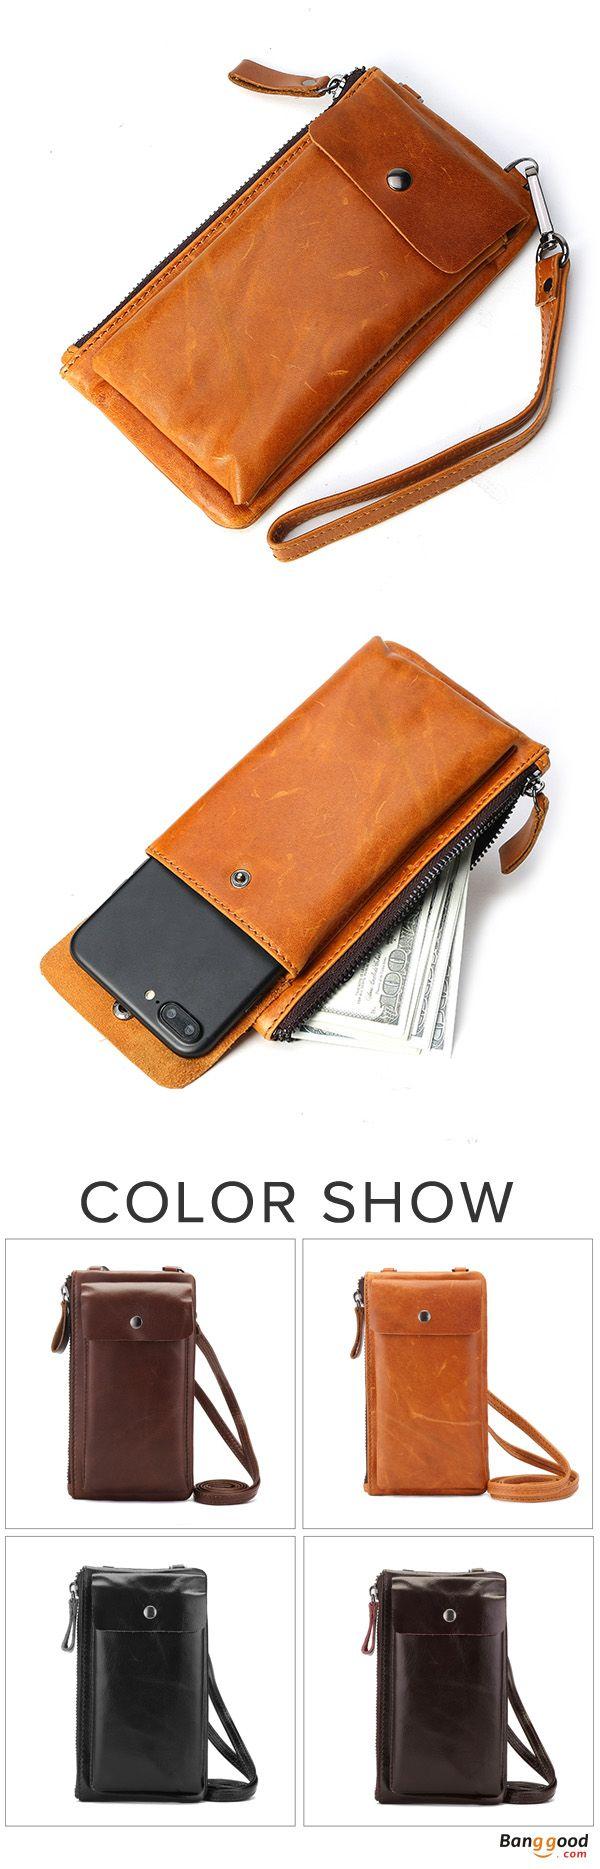 US$22.28+Free shipping. Women's Bag, Phone Bag, Wallet, Genuine Leather, Lightweight. Color: Black, Dark Brown, Light Brown, Dark Purple, Coffee. Shop now~